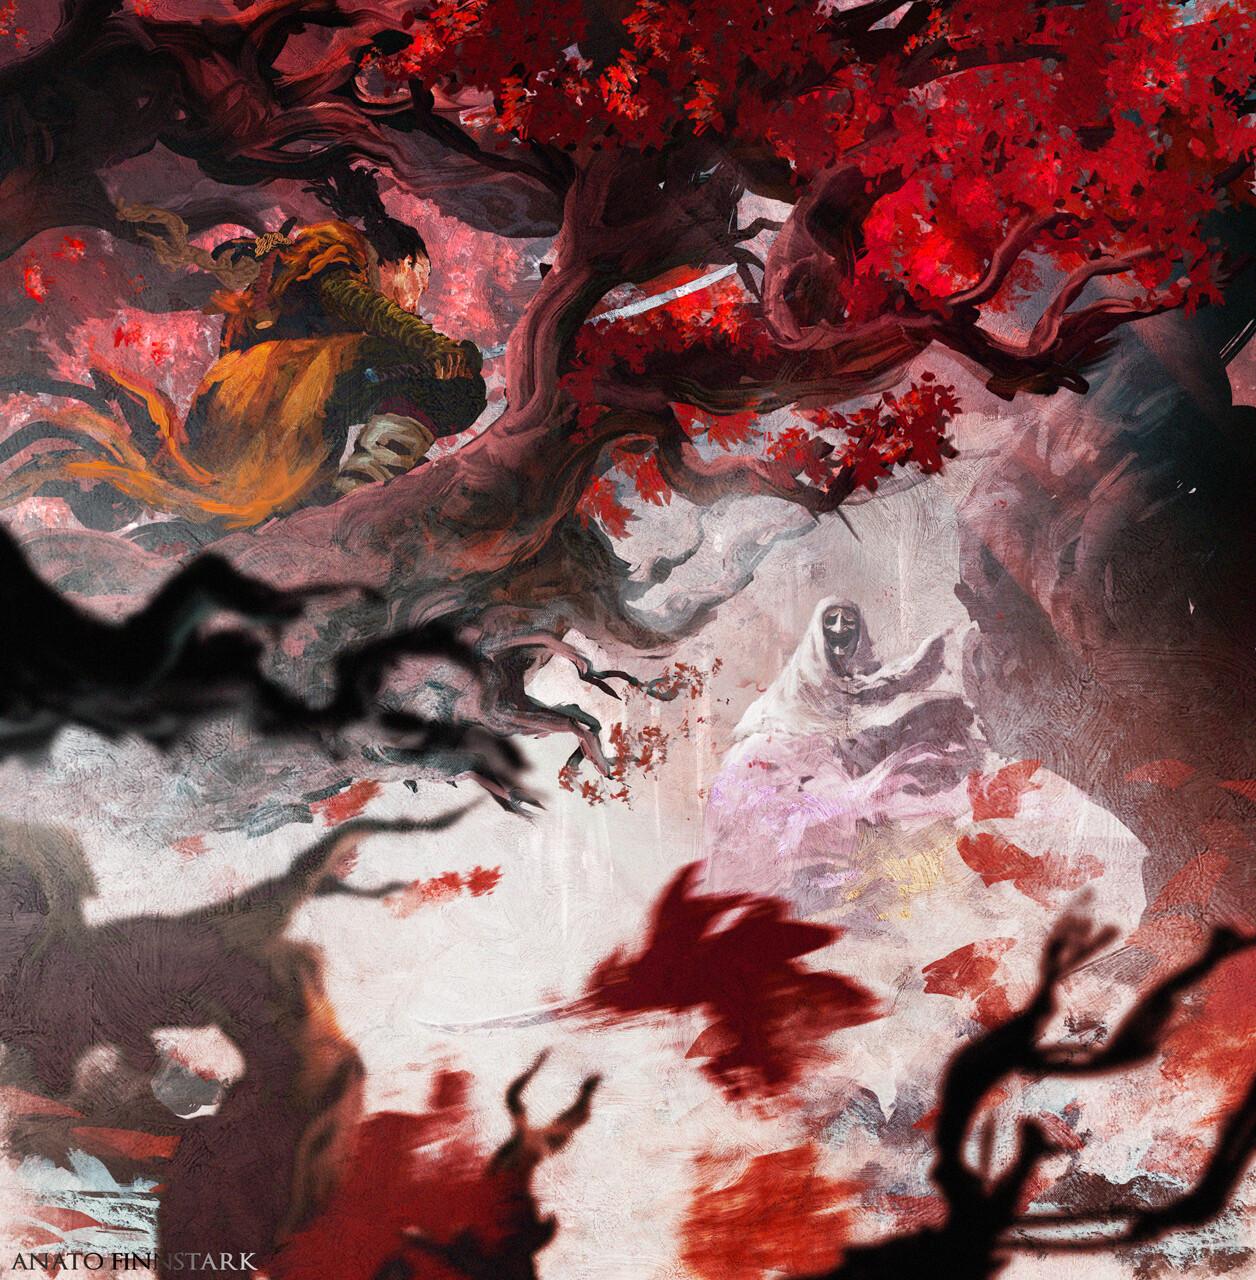 Sekiro Vs Corrupted Monk by Anato Finnstark